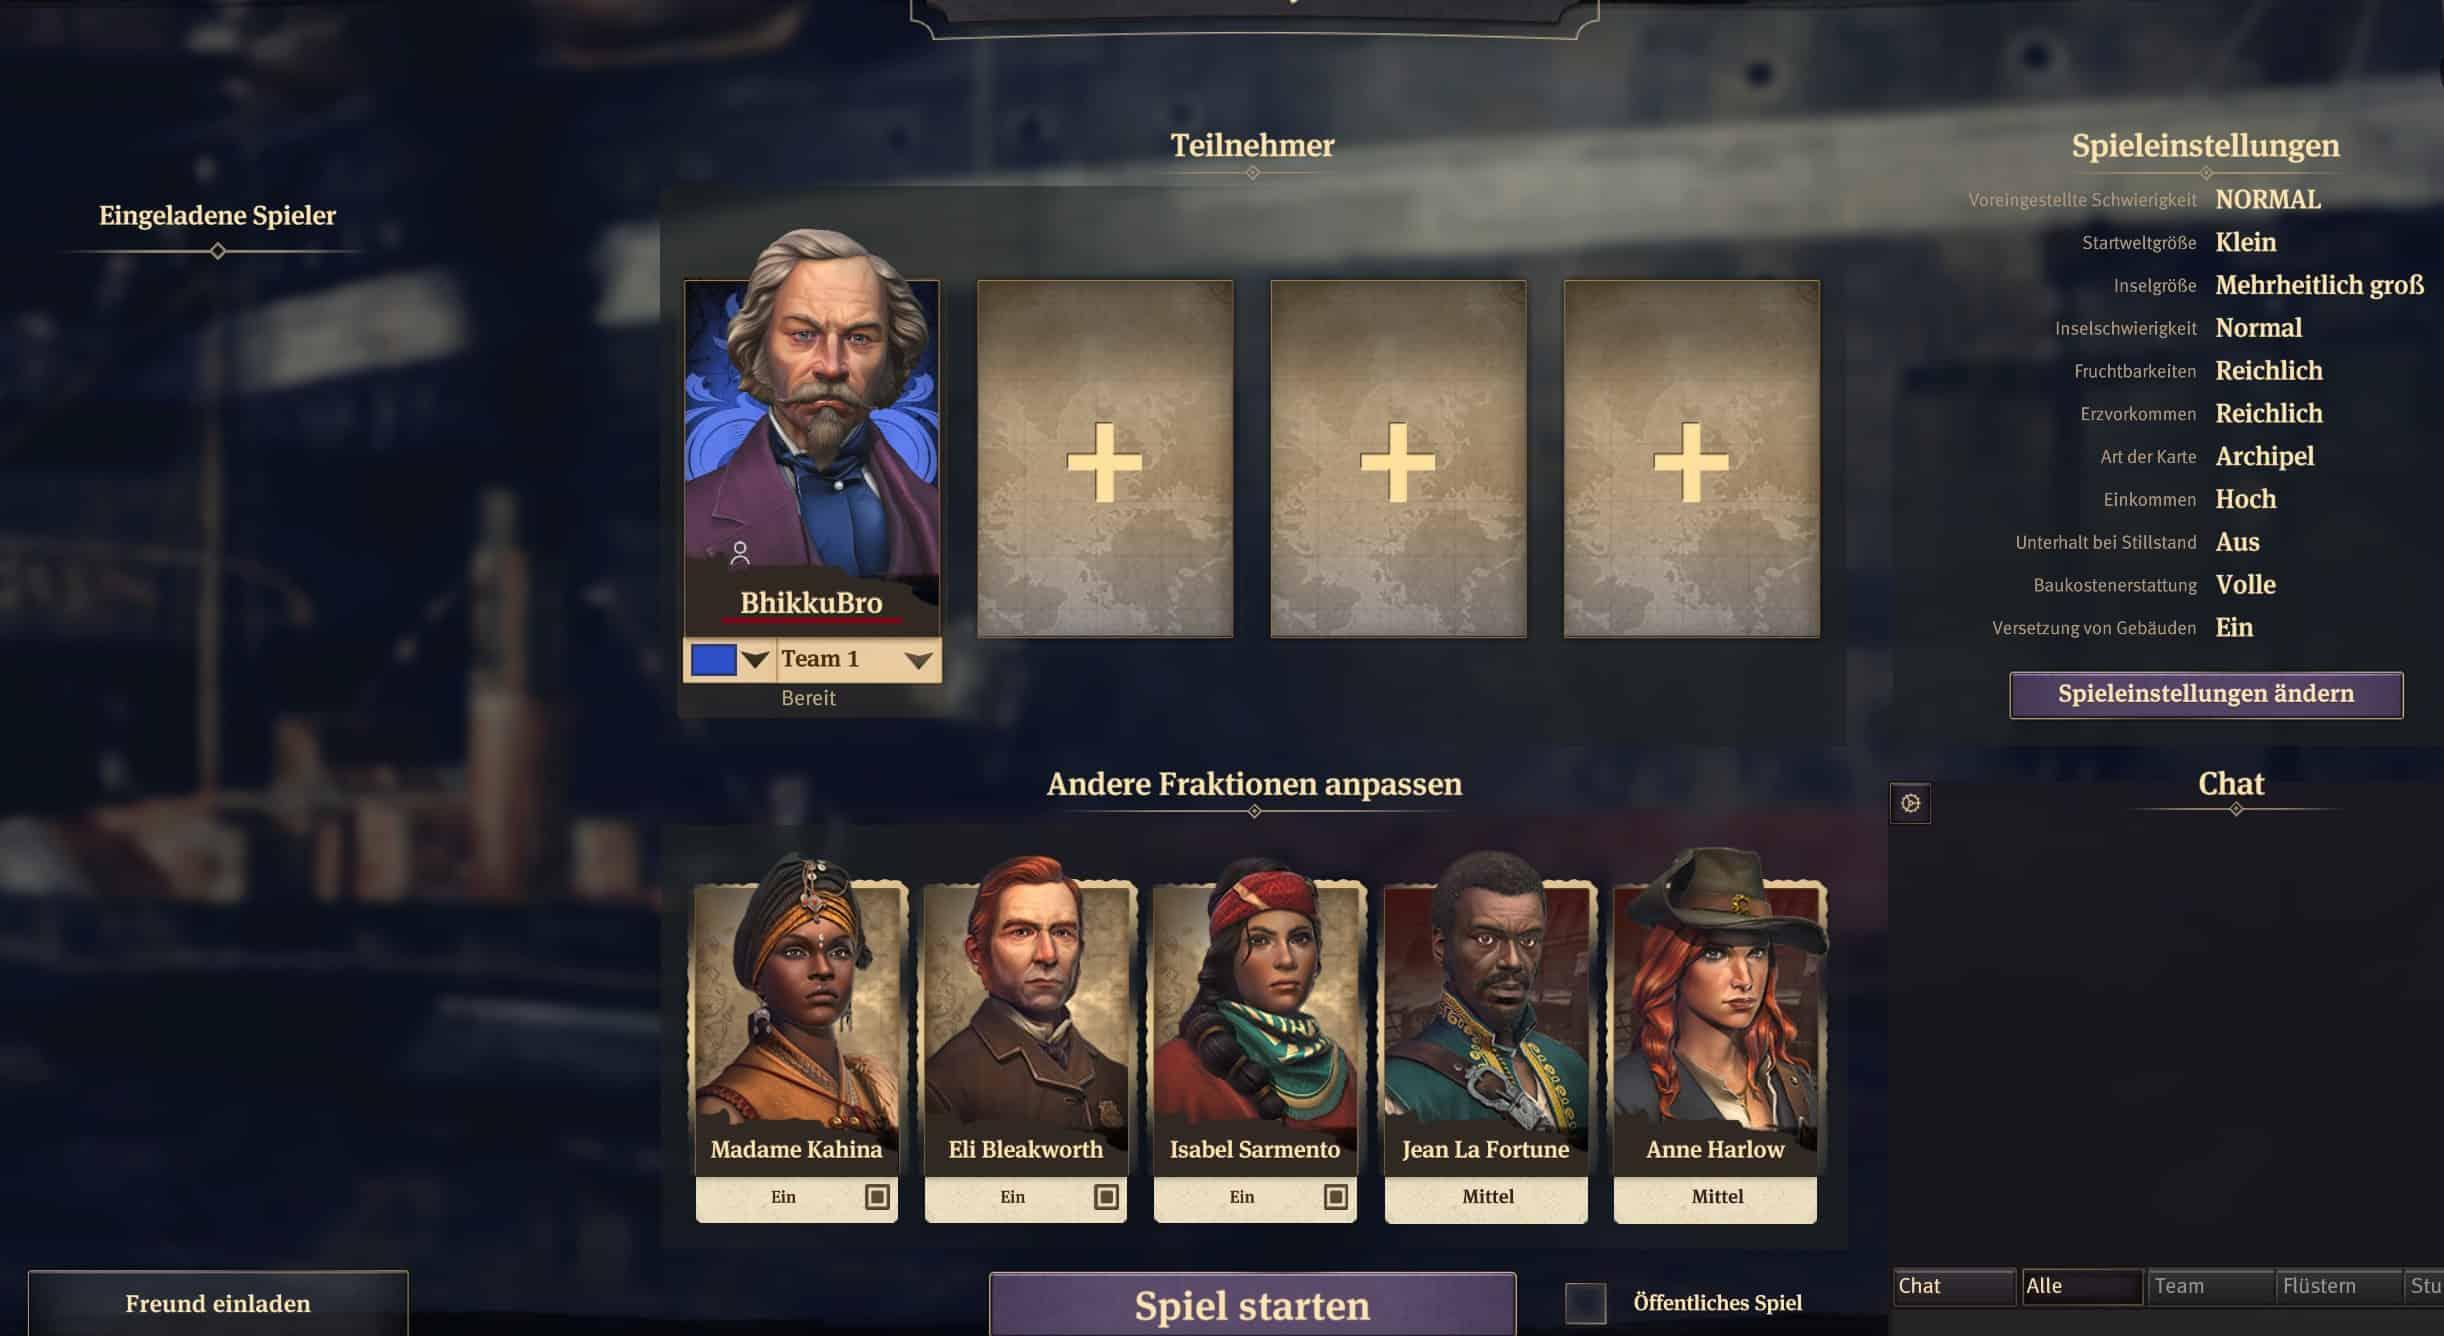 alte-gottheiten-gamer-namen